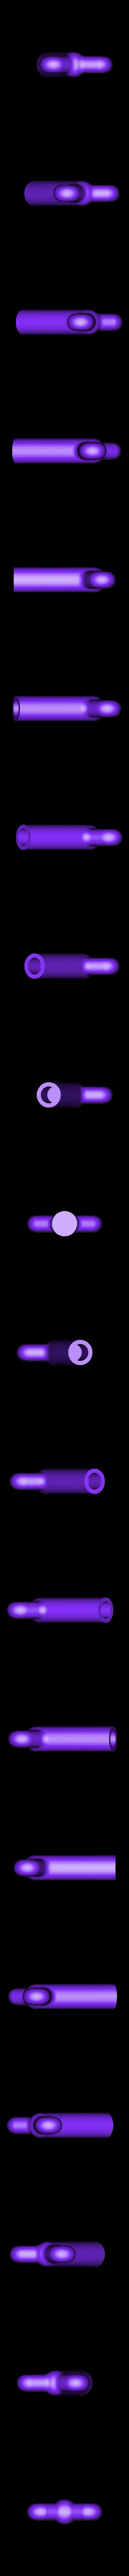 bone.STL Download STL file Among Us Self Watering Planter • Object to 3D print, JoshuaDomiel